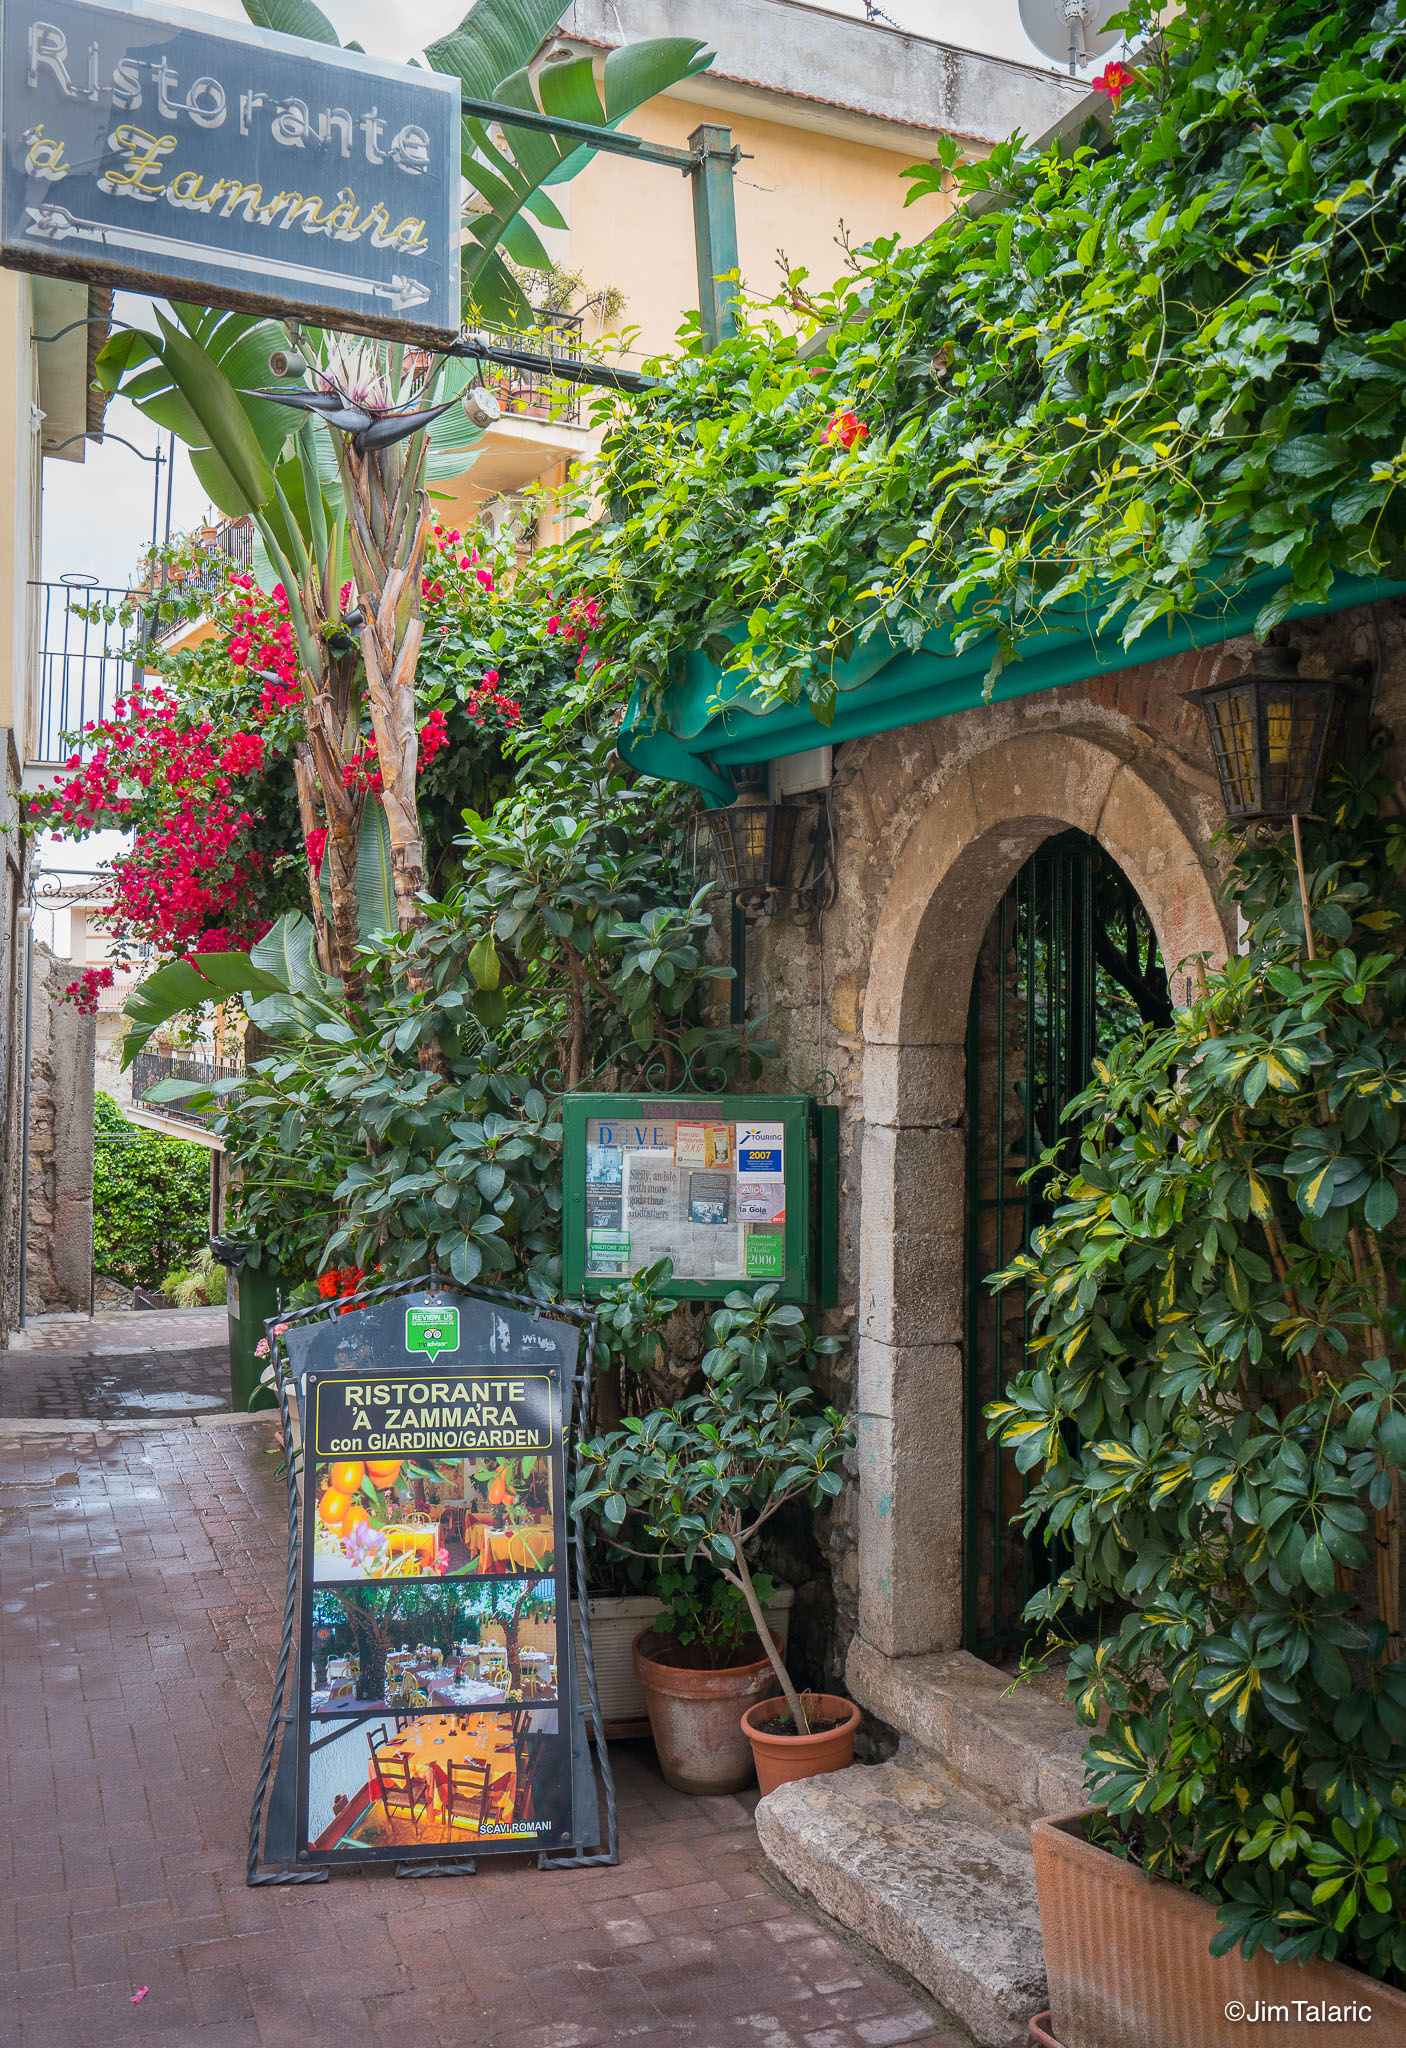 160521-Sicily-060.jpg